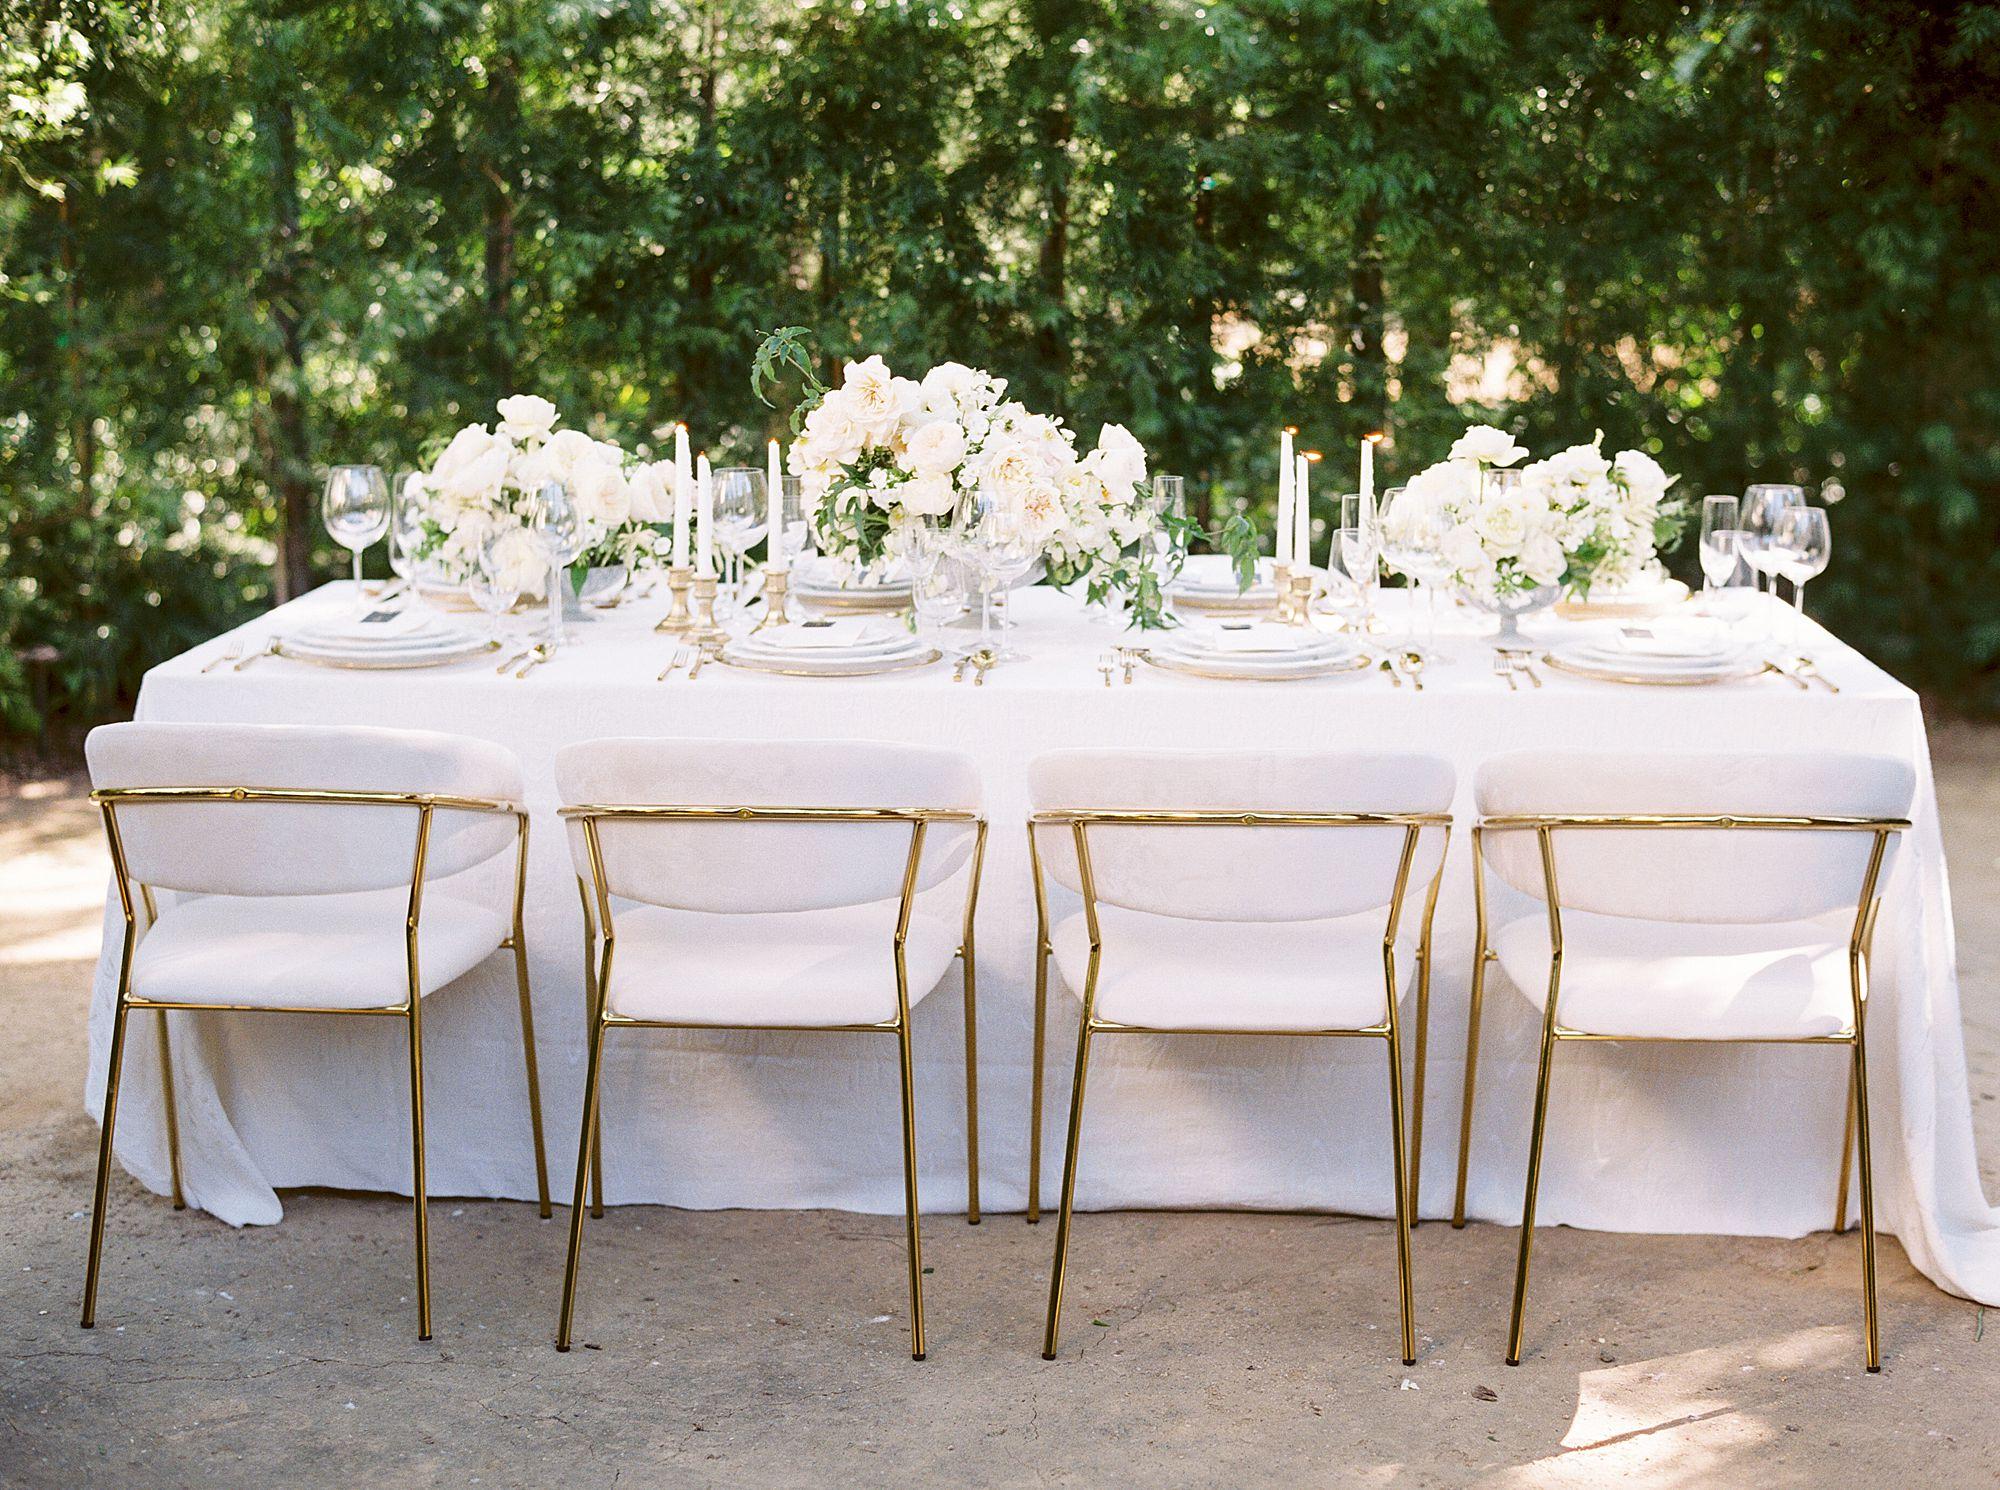 Park Winters Micro-Wedding Inspiration on Style Me Pretty - Stephanie Teague Events - Ashley Baumgartner - Park Winters Wedding - Black Tie Wedding - Micro-Wedding Sacramento Photographer_0078.jpg